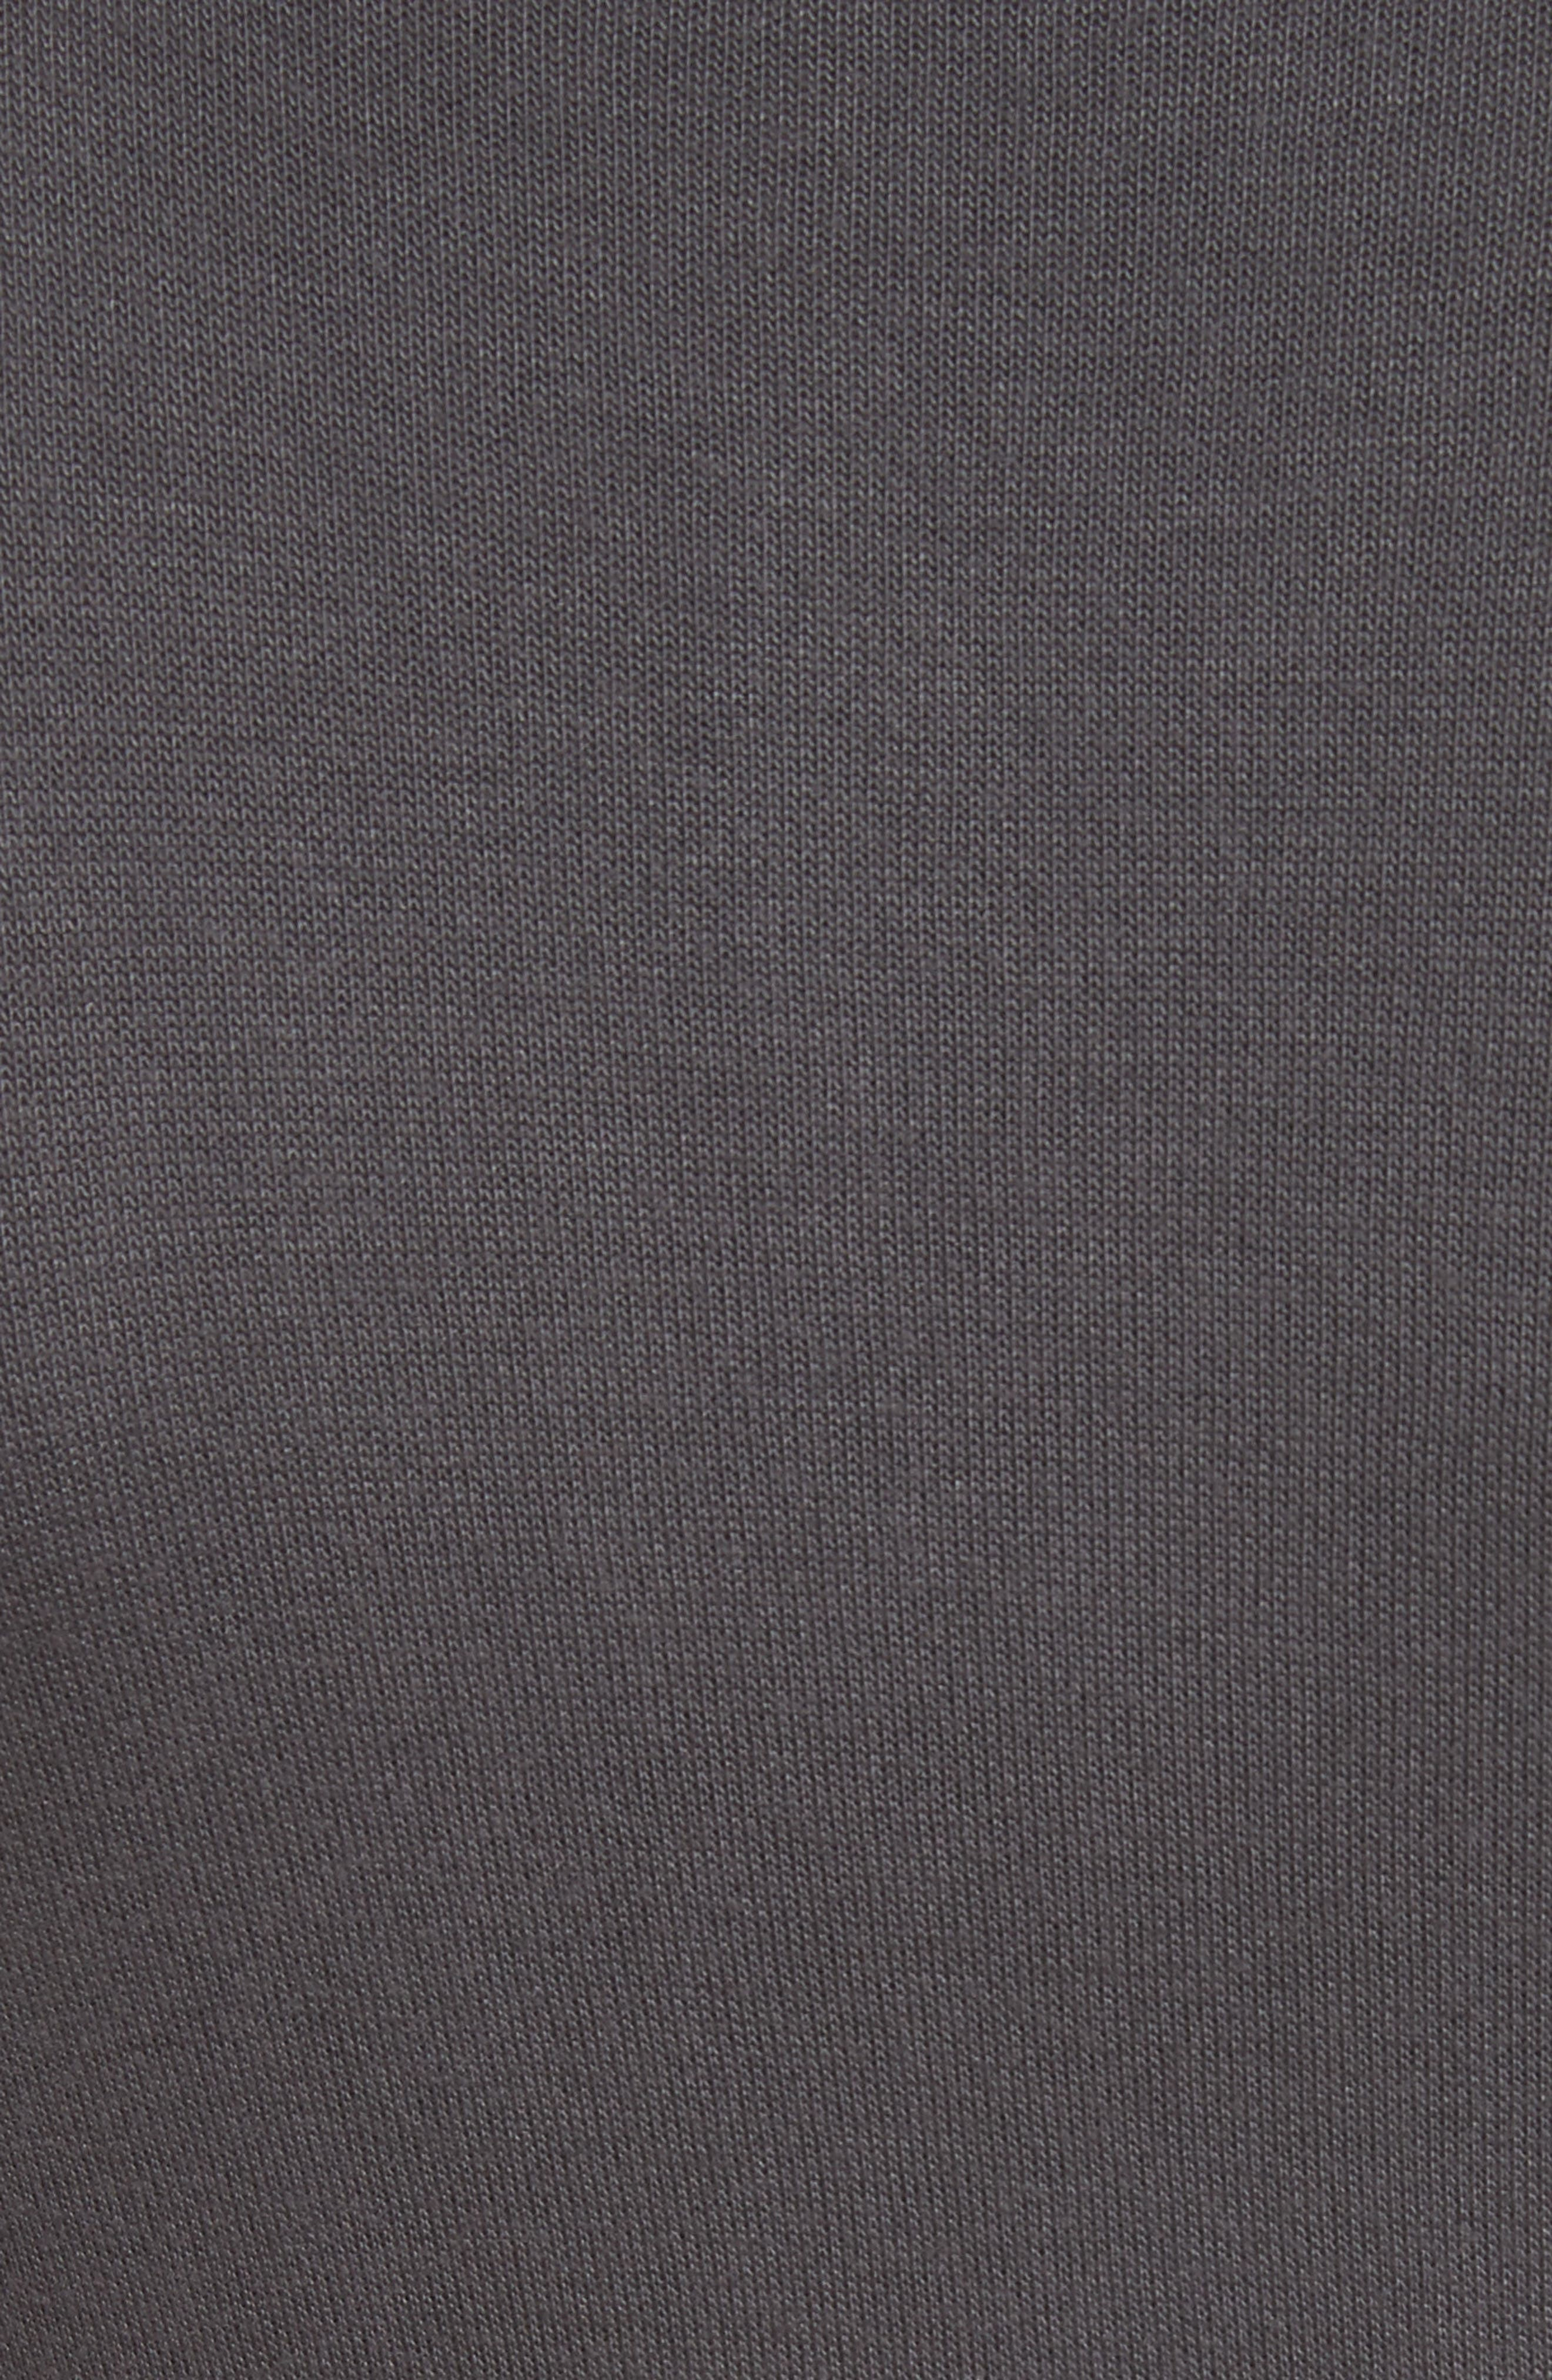 Body-Con Turtleneck Dress,                             Alternate thumbnail 5, color,                             Gunmetal